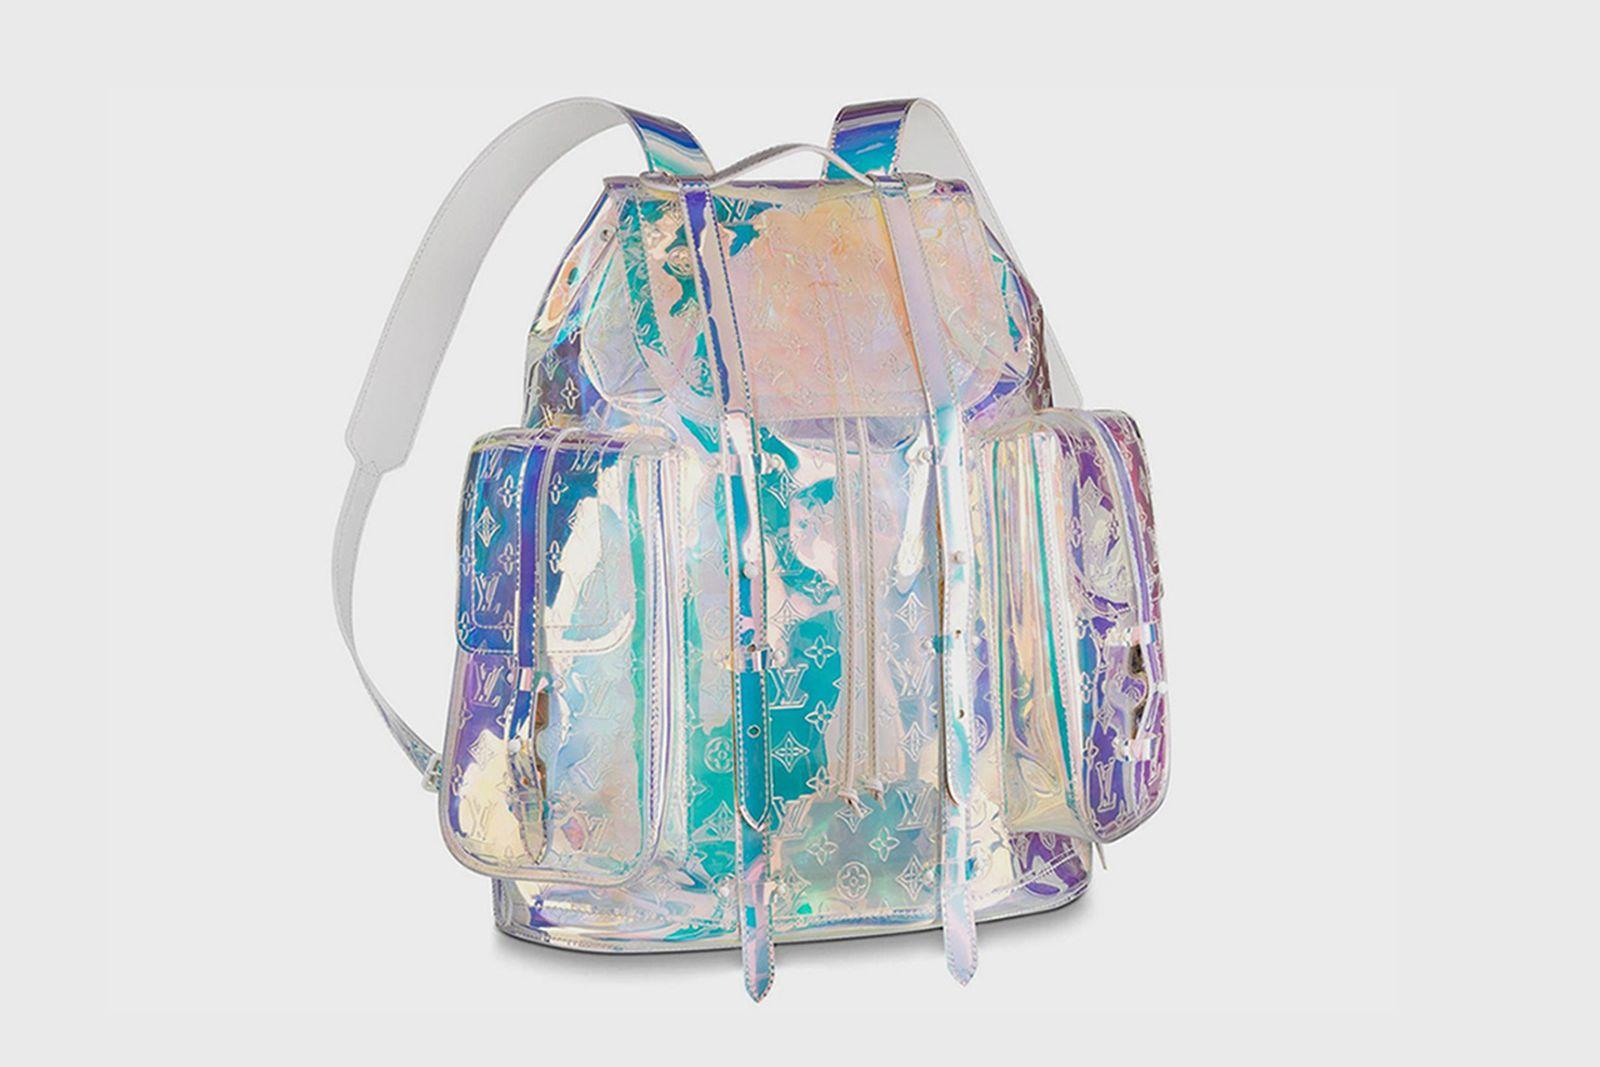 Louis Vuitton Christopher Backpack main1 StockX virgil abloh